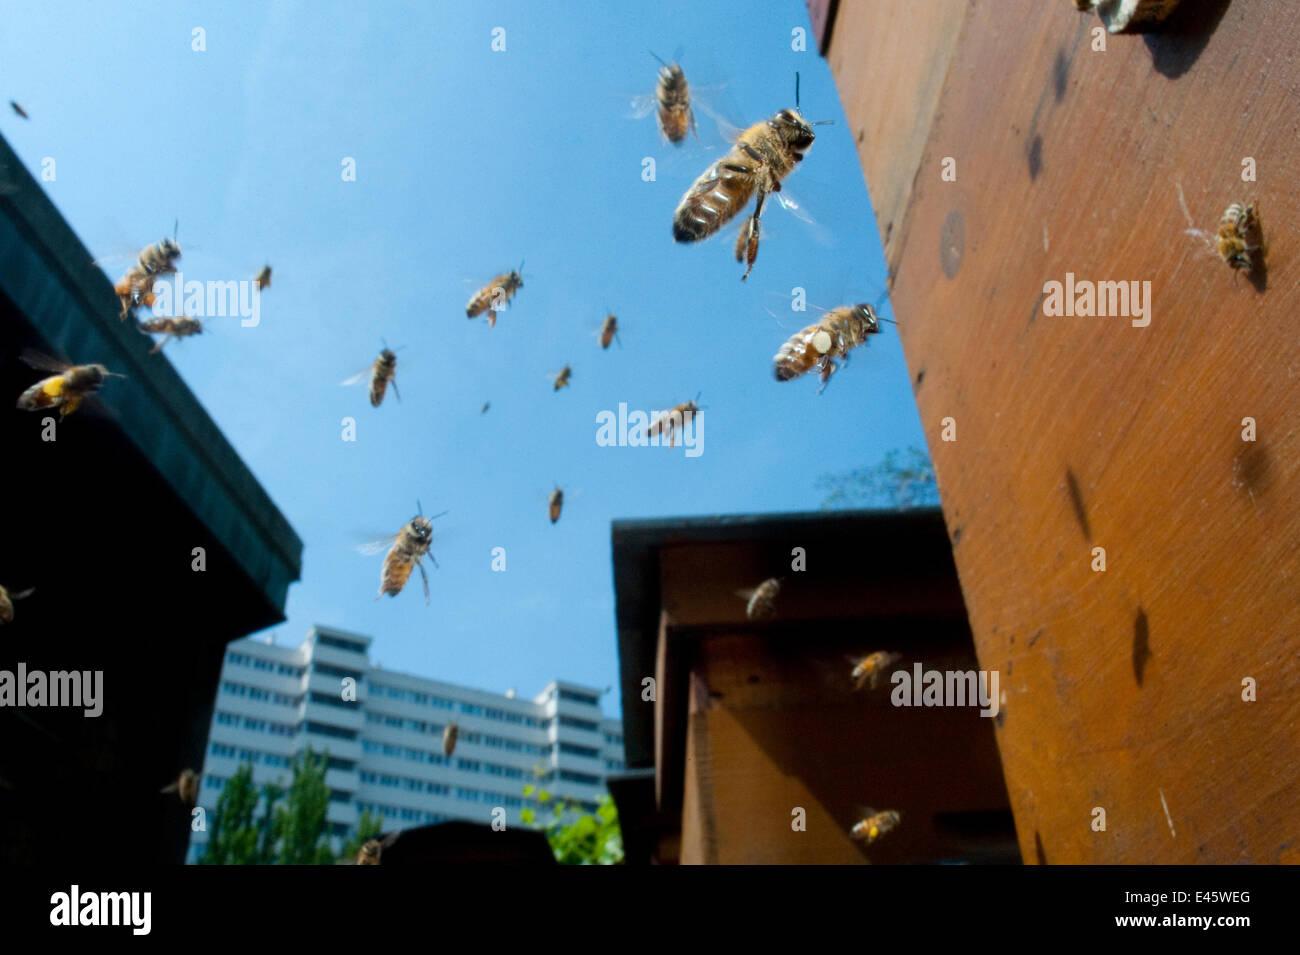 Honey bees (Apis melifera) flying in city. Paris, France Stock Photo